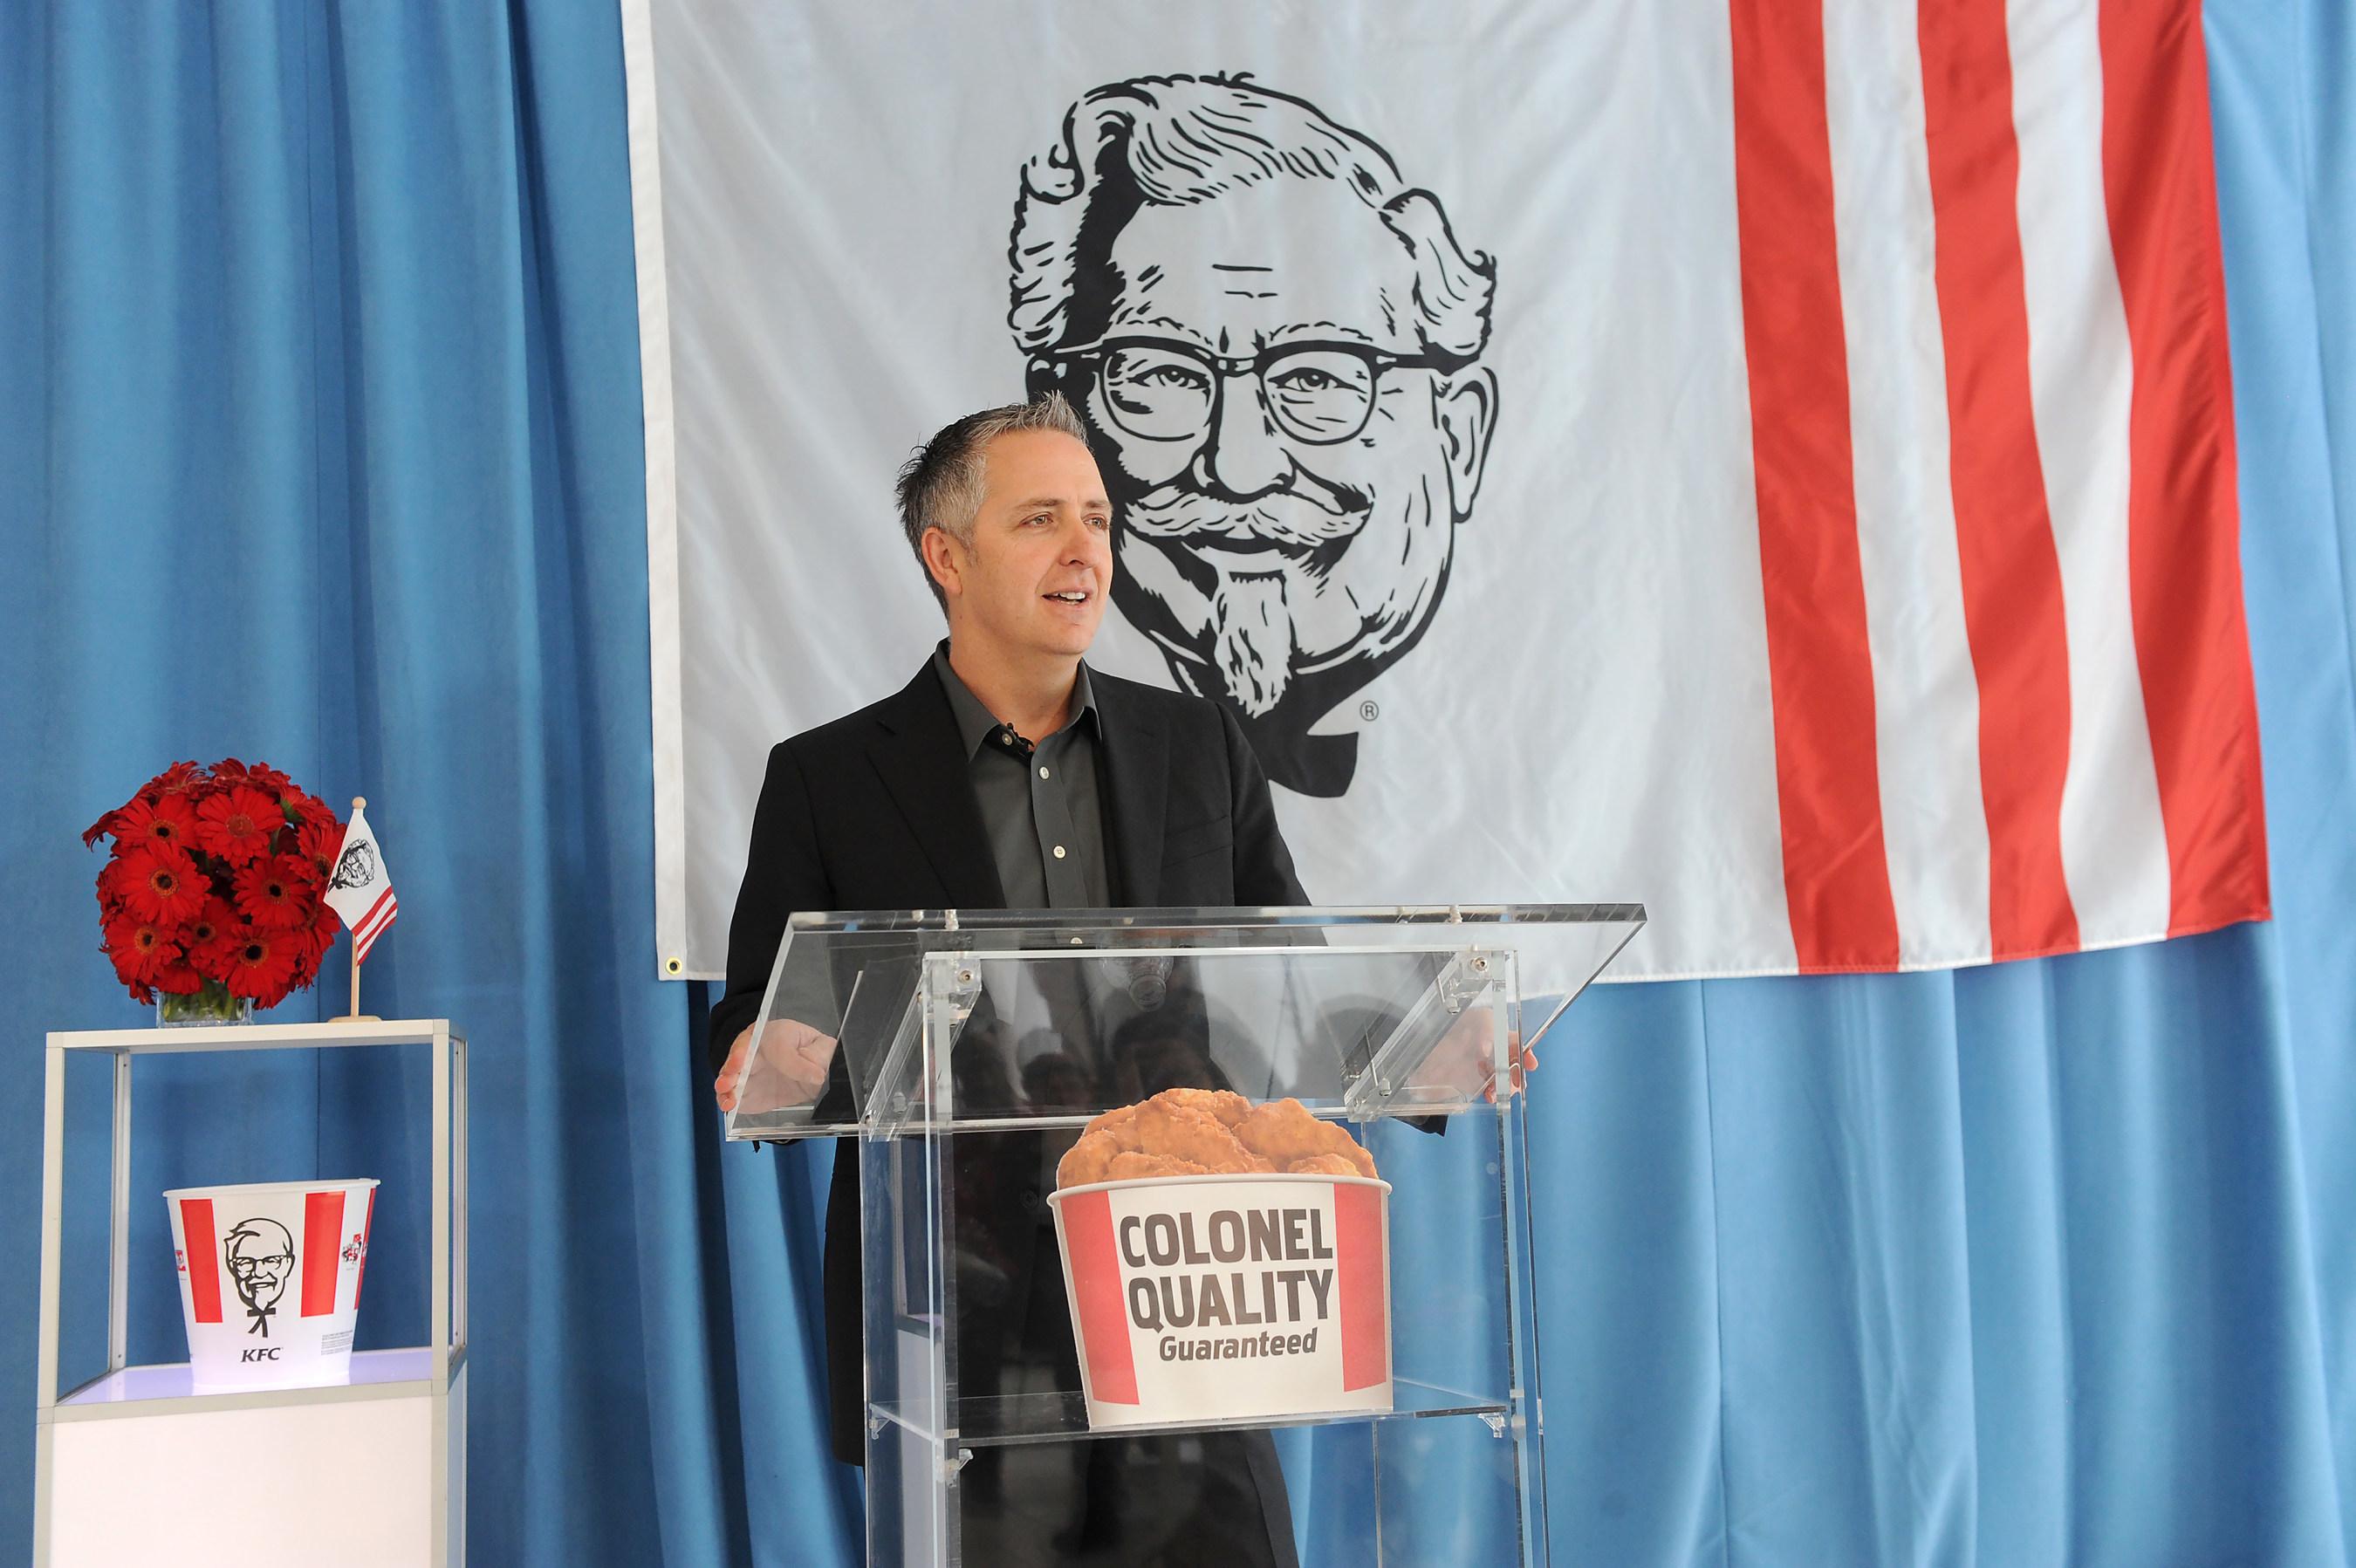 Jason Marker, KFC U.S. President, announces Re-Colonelization at the KFC event on Monday, April 4, 2016 in New York City. (Diane Bondareff/AP Images for KFC)